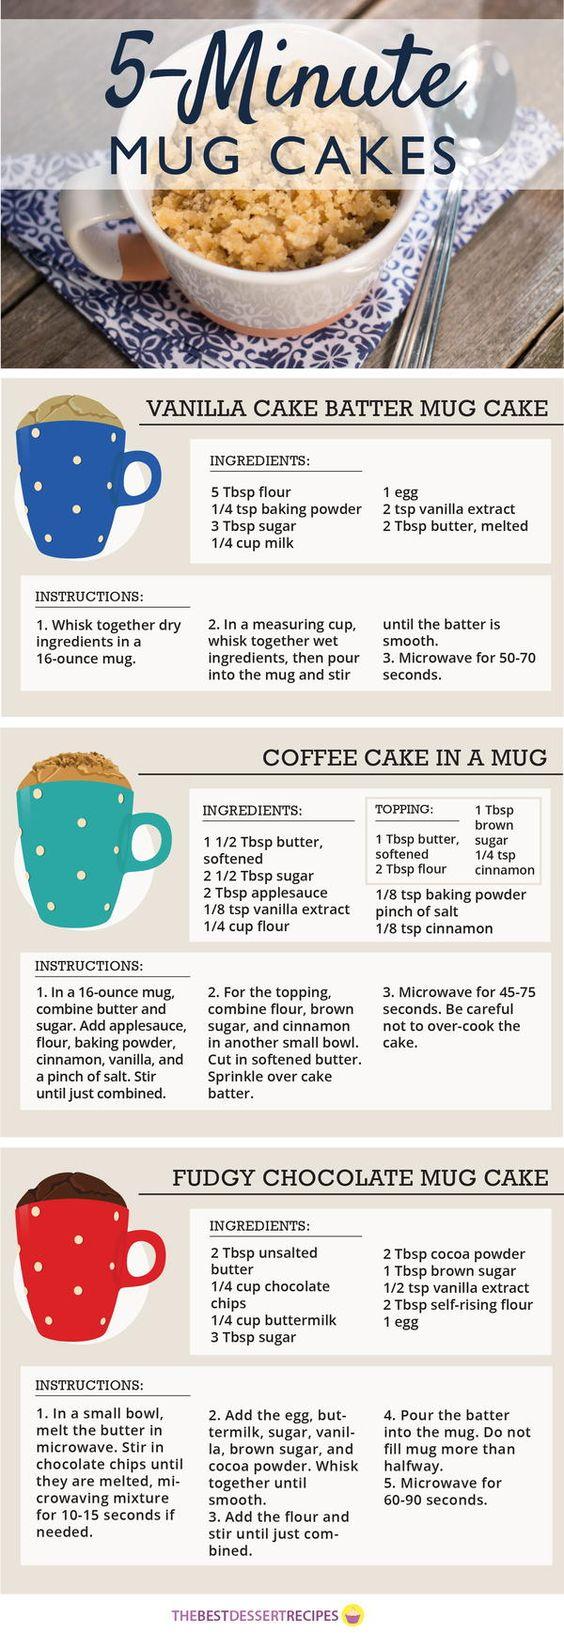 5 Minute Mug Cakes Afternoon Tea 4 Two